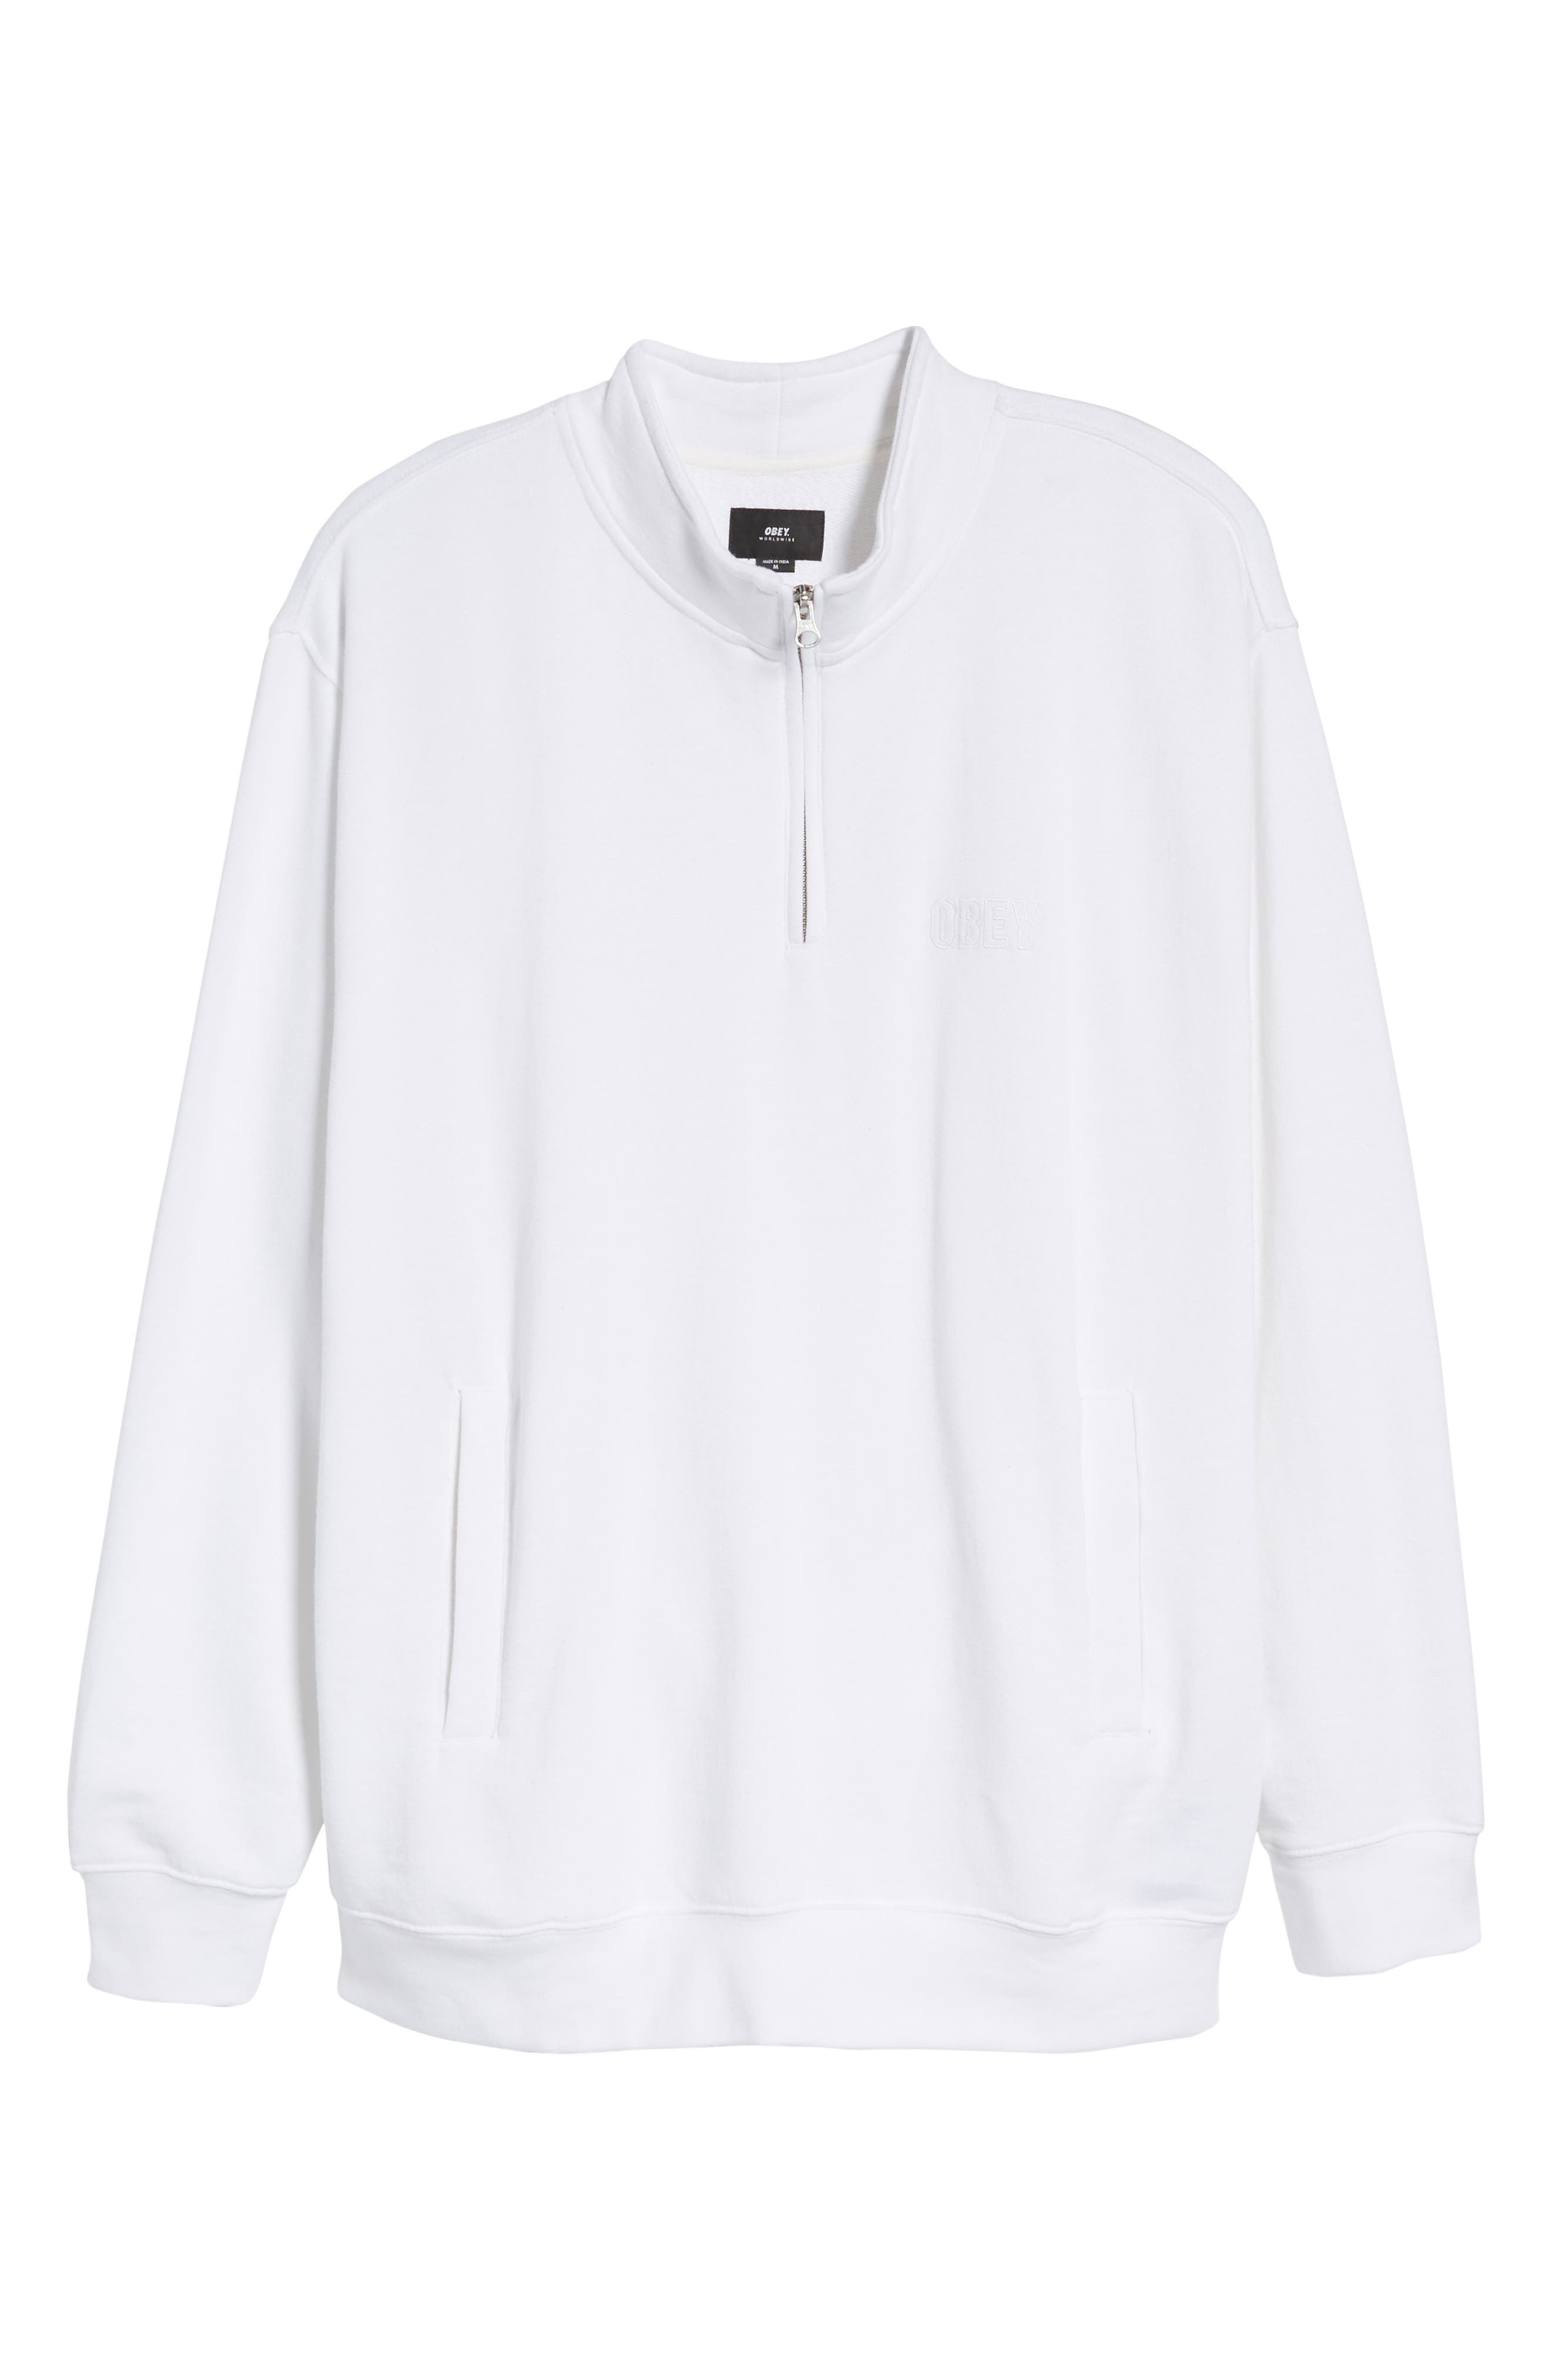 Atomatic Quarter-Zip Fleece Pullover,                             Alternate thumbnail 6, color,                             100